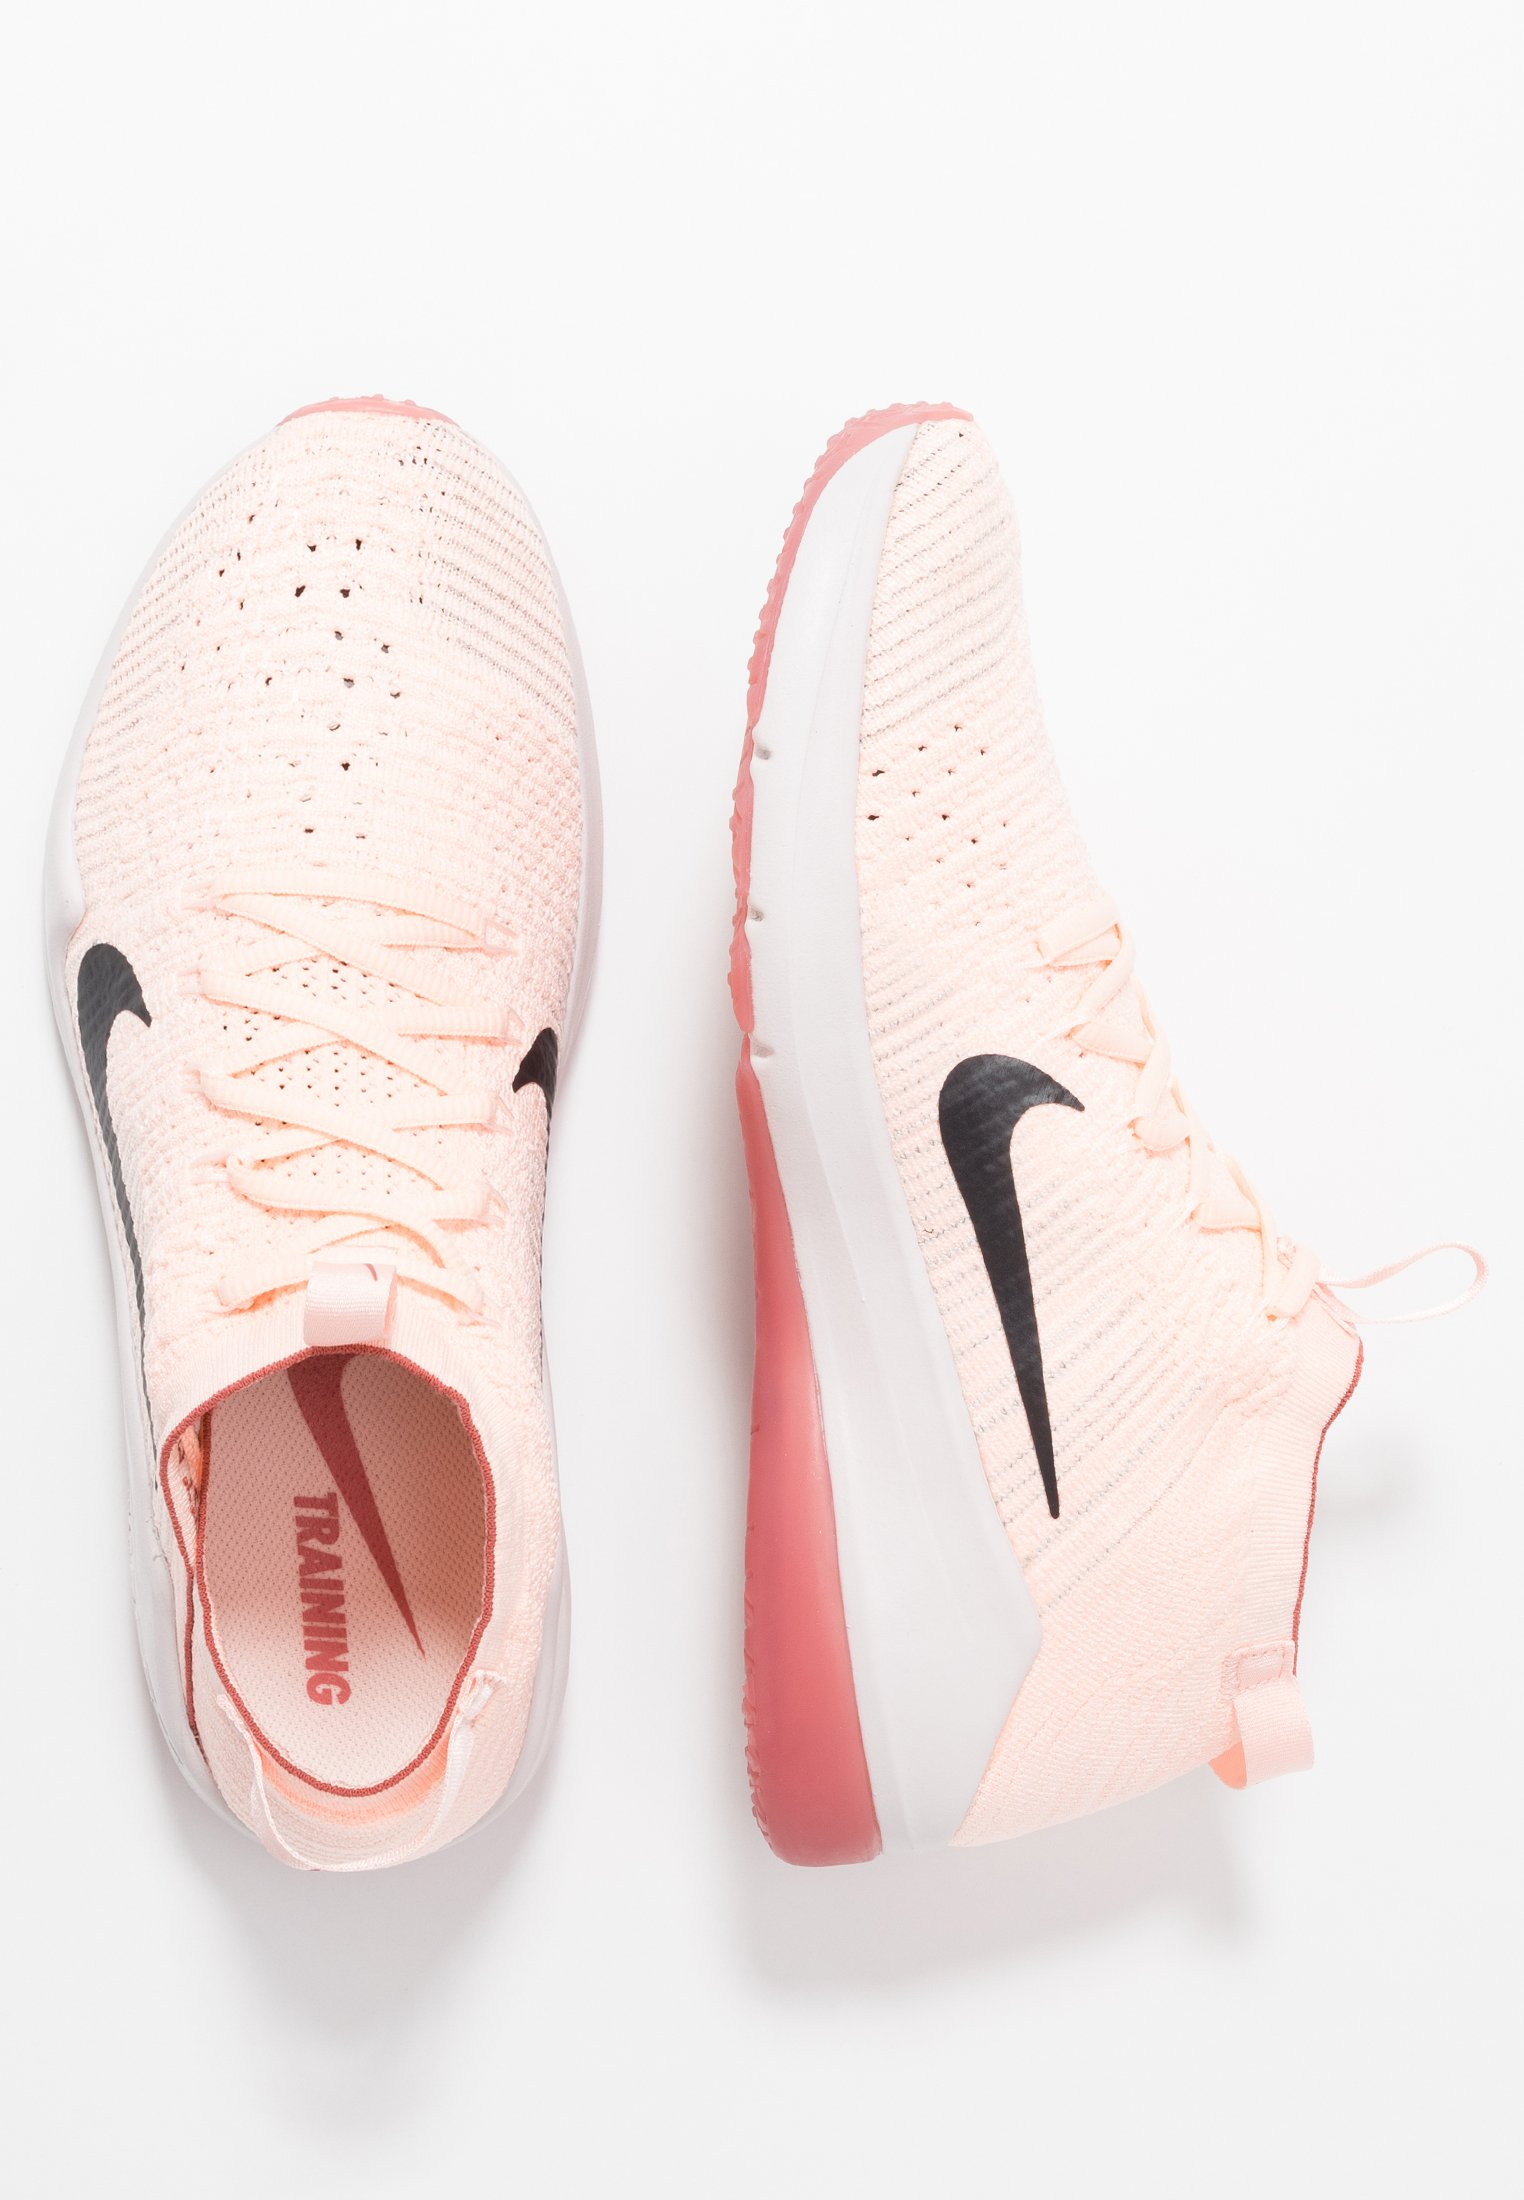 AIR ZOOM FEARLESS FK 2 Chaussures d'entraînement et de fitness echo pinkoil greylight soft pinklight redwood